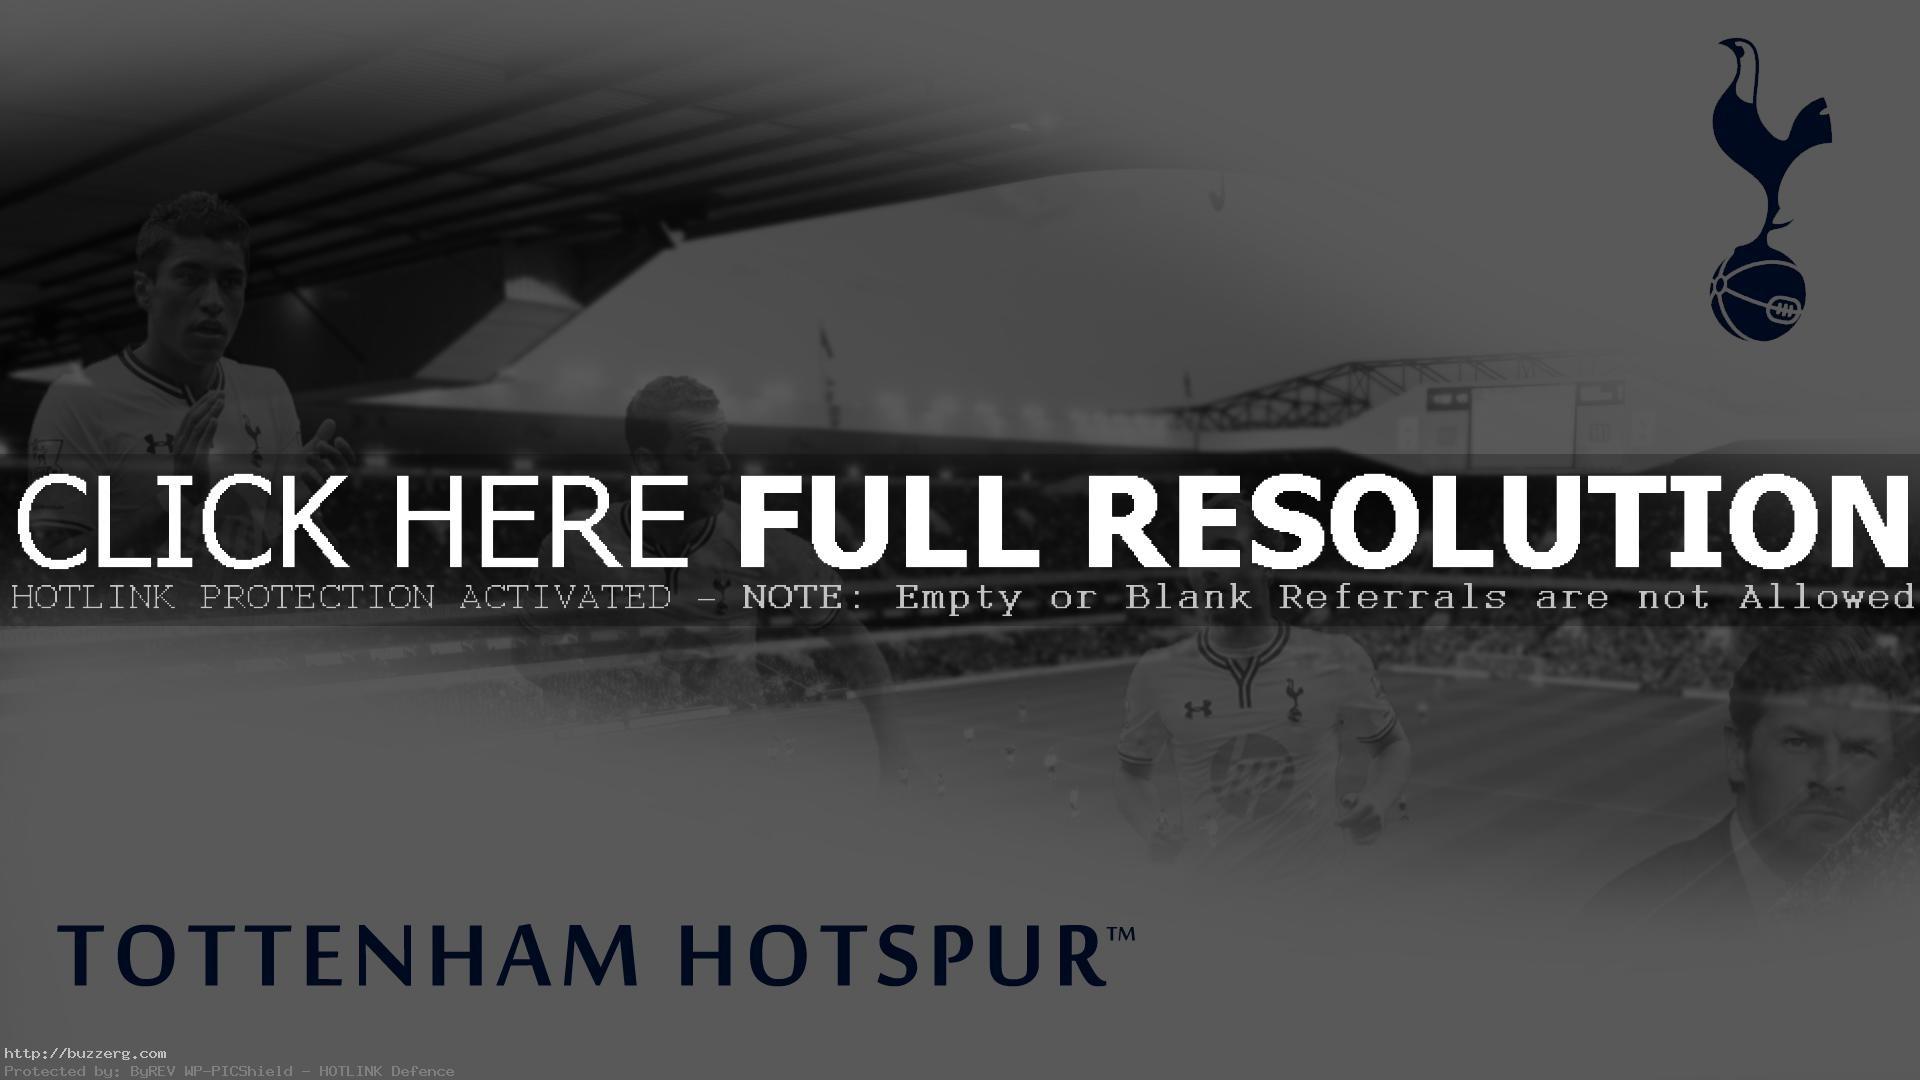 BPL Team Tottenham Hotspur (id: 138668)